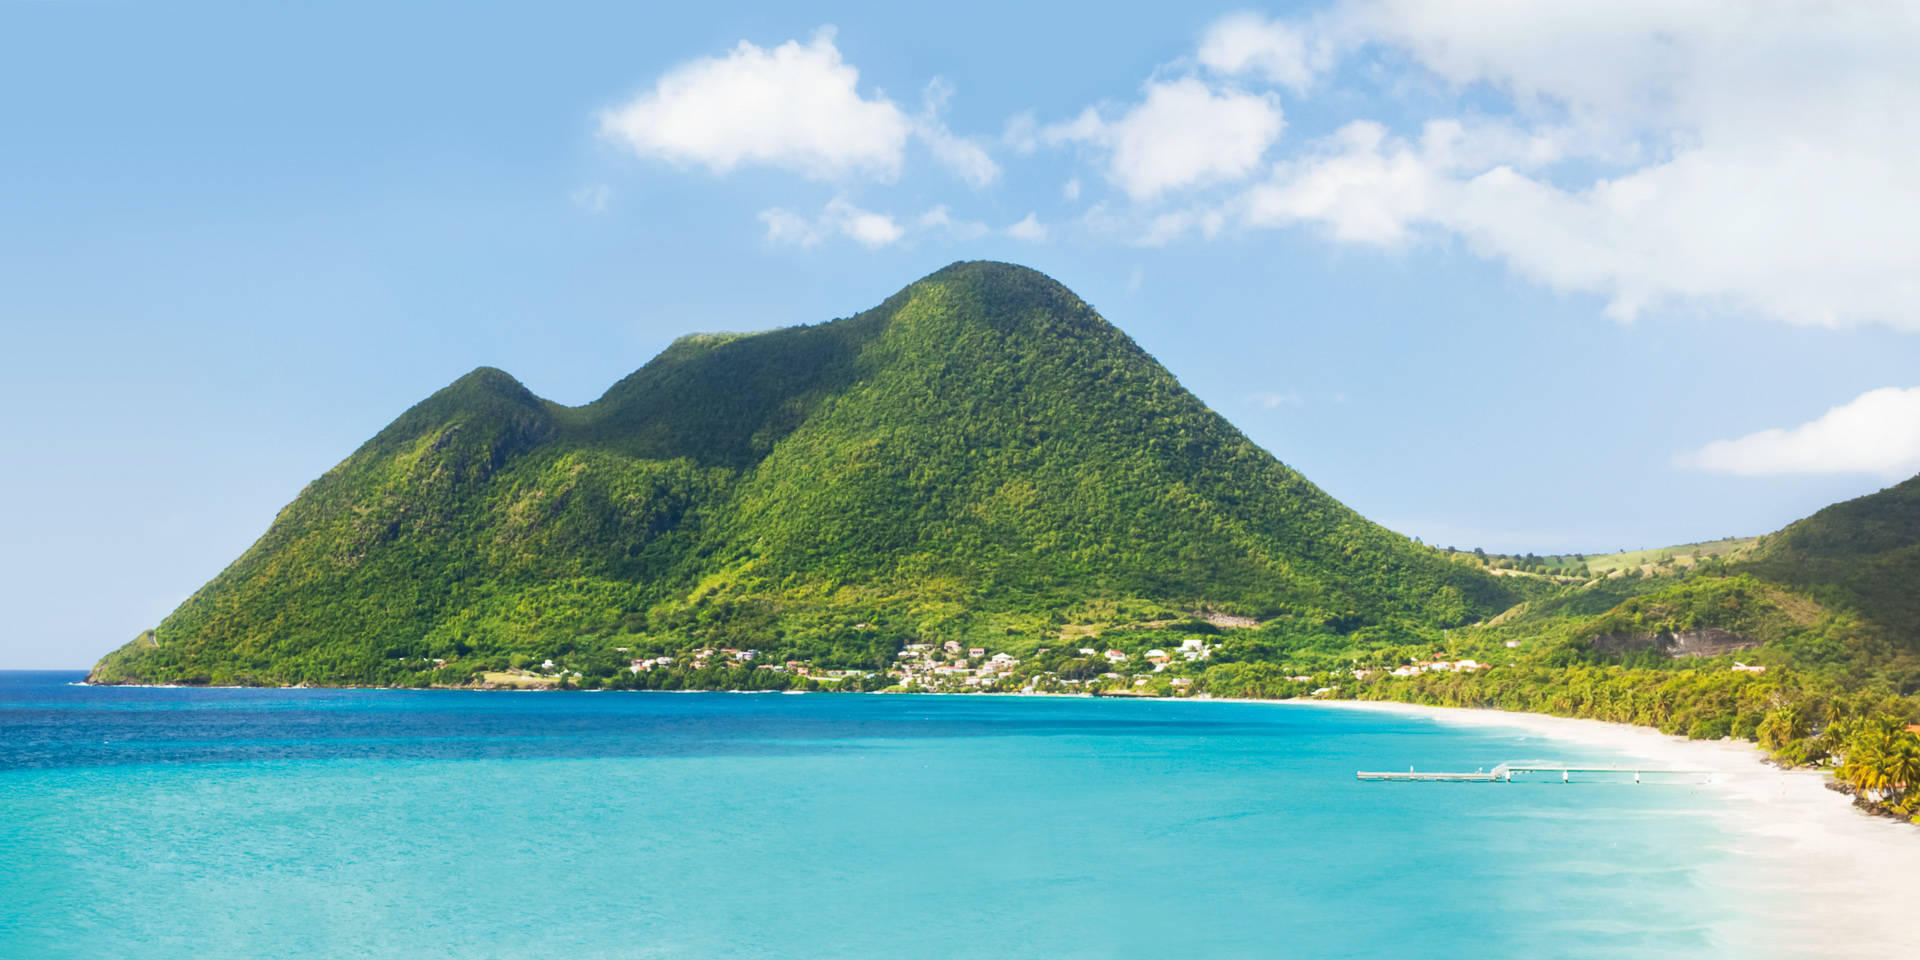 Tropical island in the Caribbean